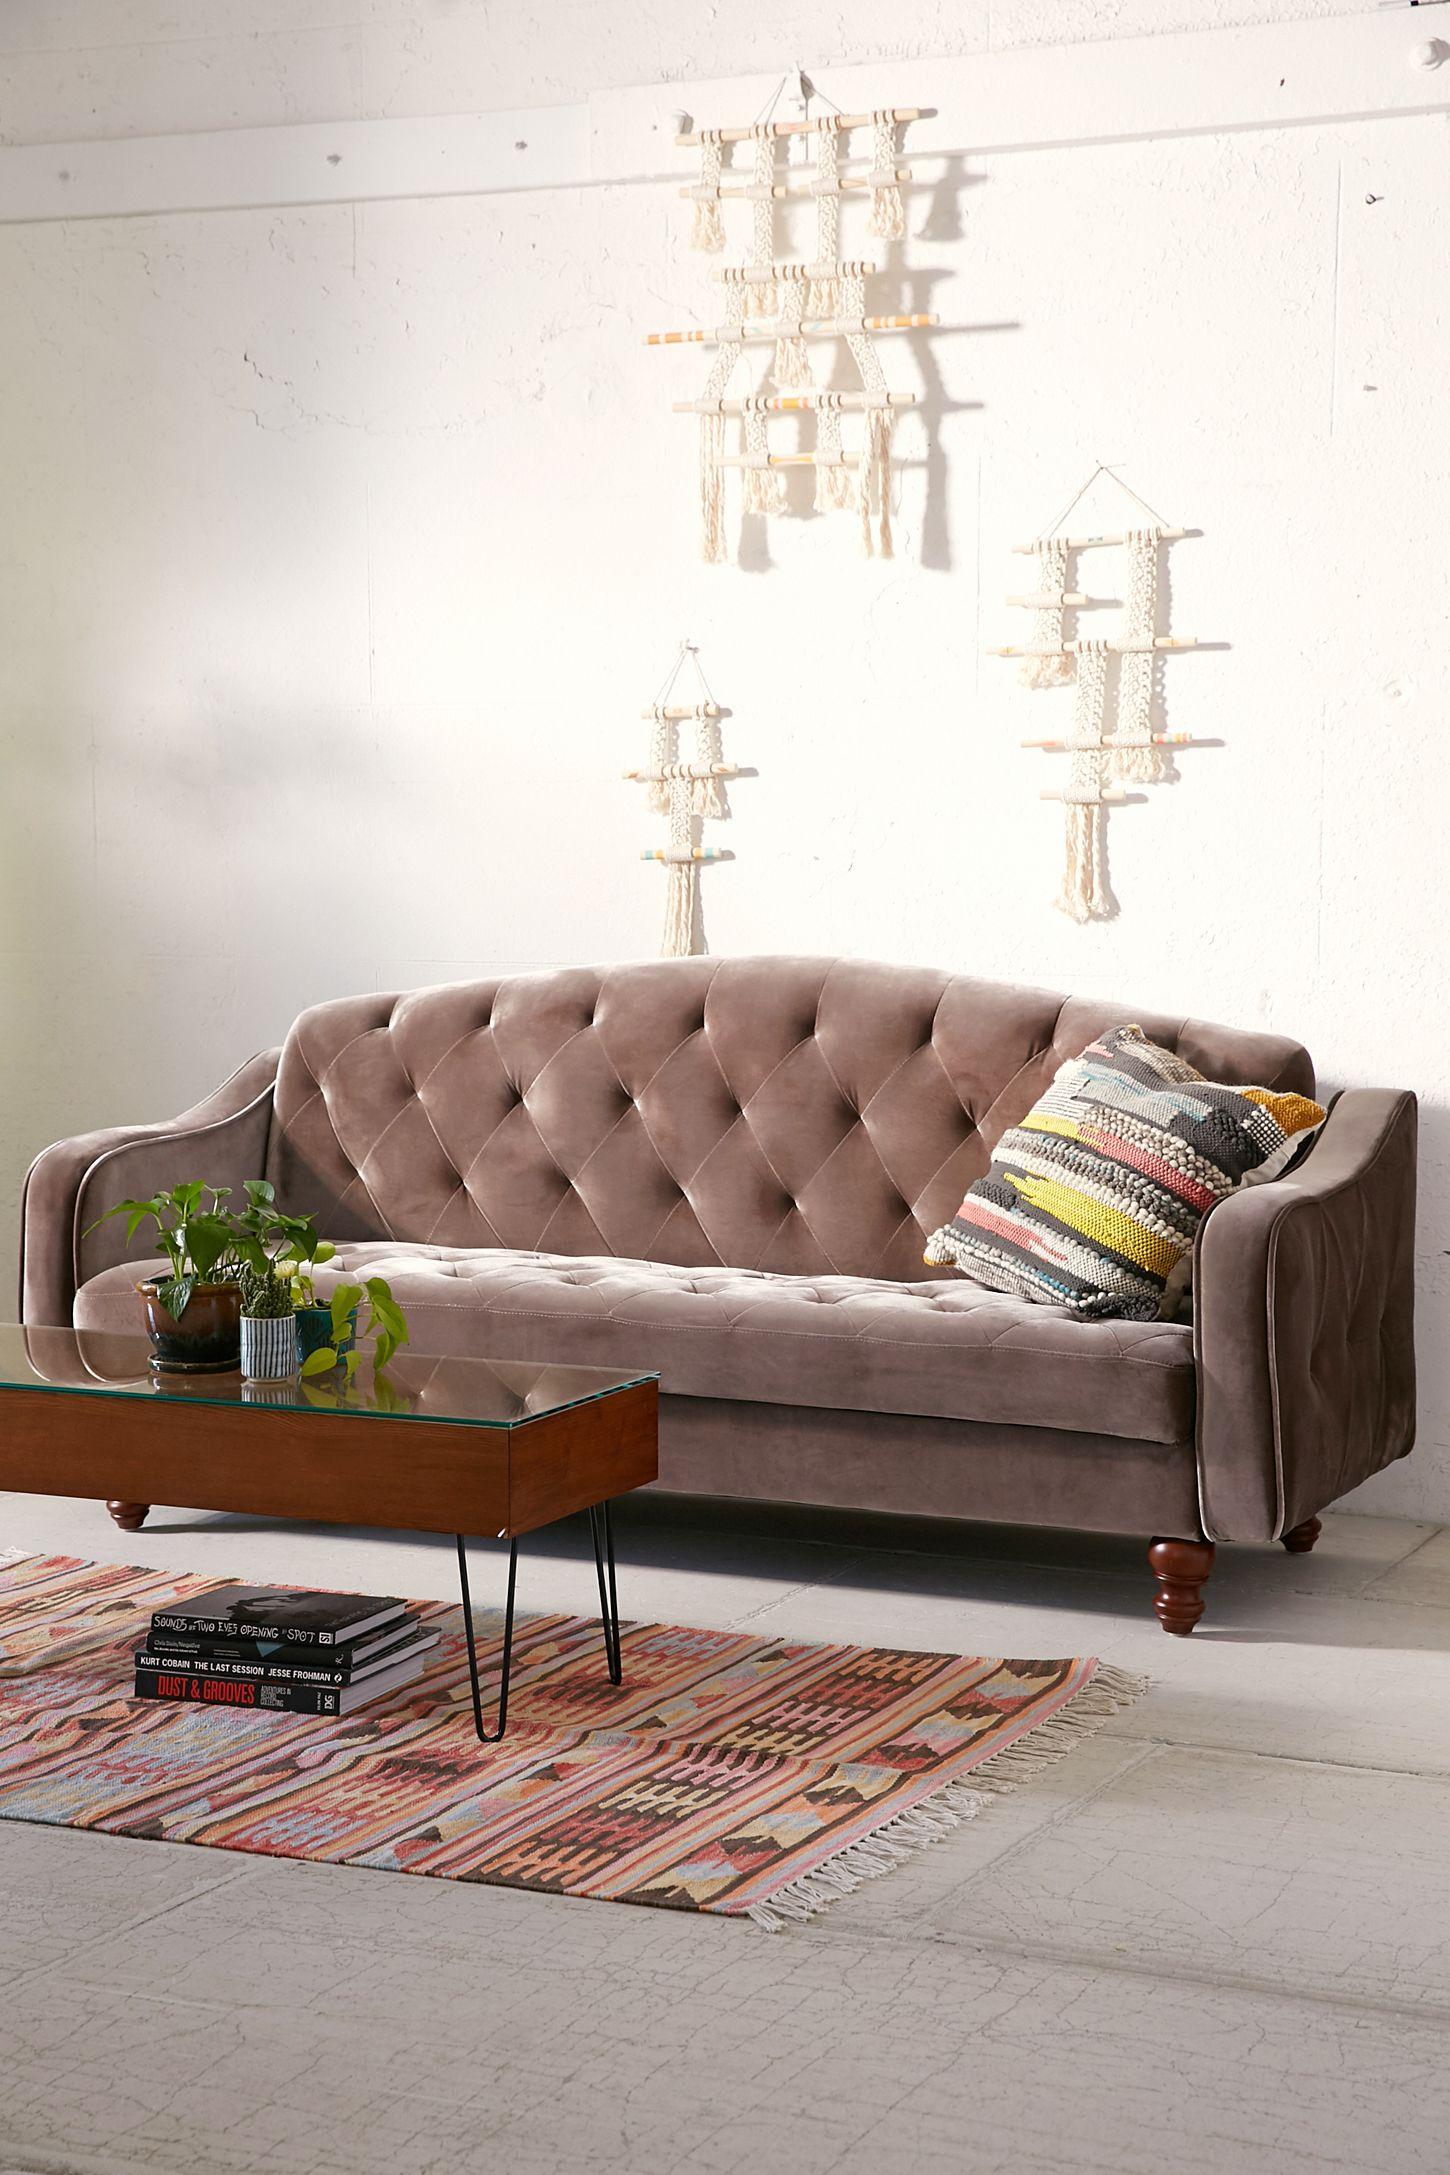 Groovy Ava Velvet Tufted Sleeper Sofa Ibusinesslaw Wood Chair Design Ideas Ibusinesslaworg